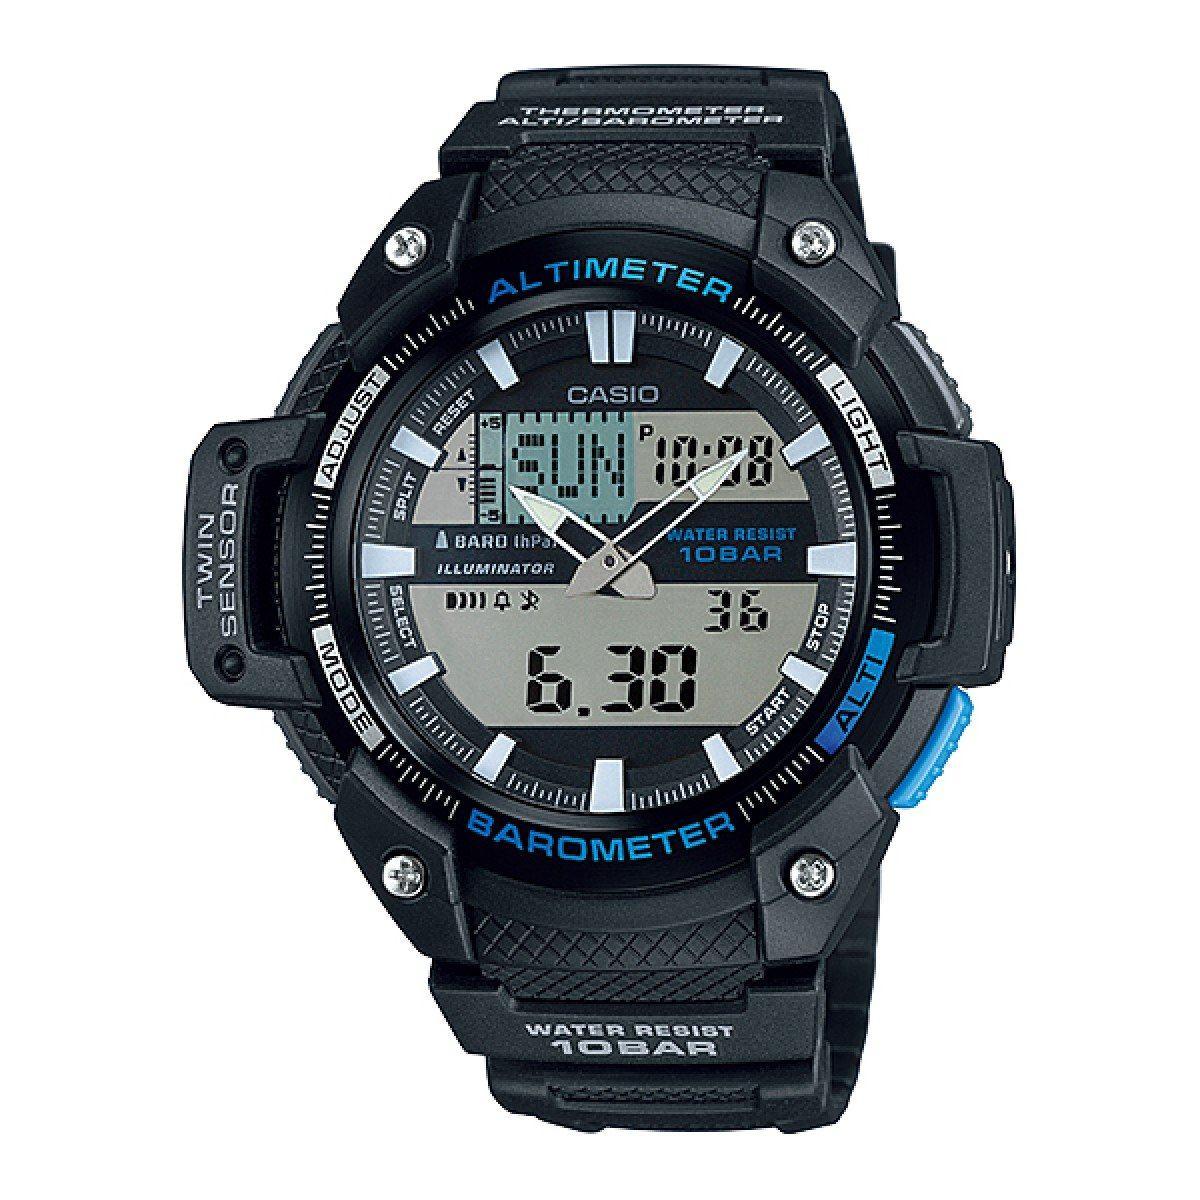 6d54c4d7325 relógio casio outgear twin sensor masculino sgw-450h-1adr. Carregando zoom.